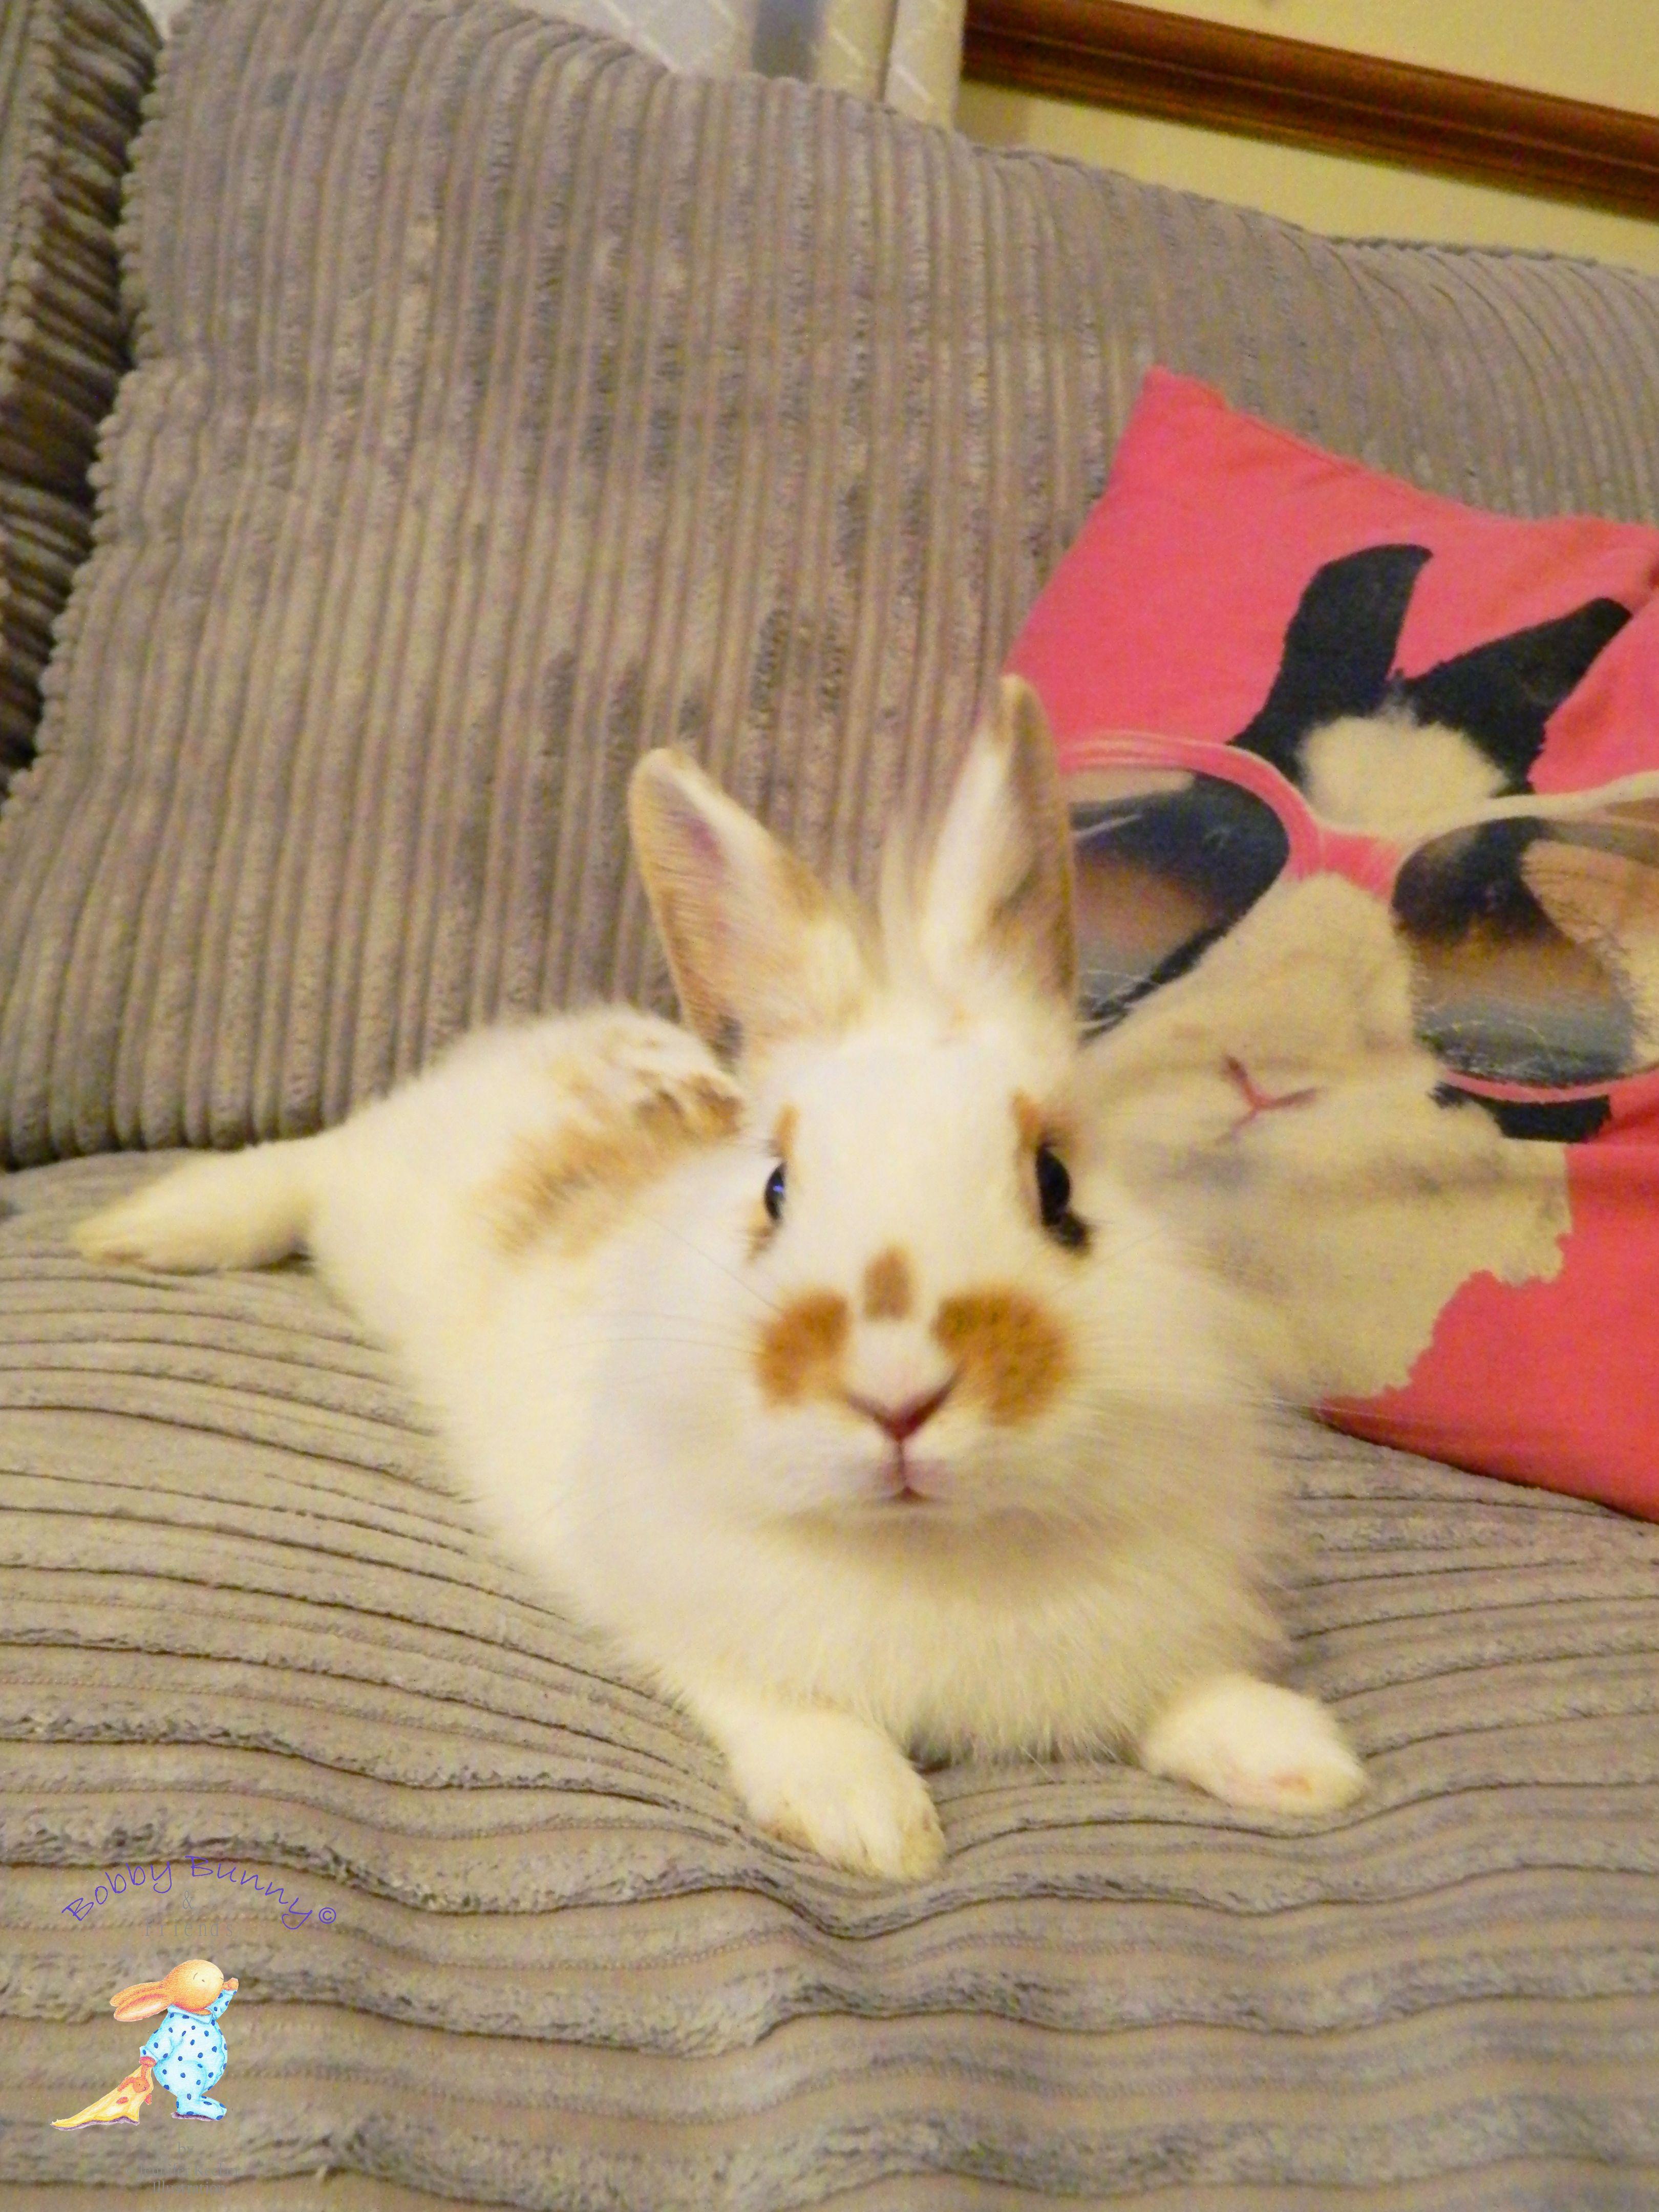 Pin by Yijun Liu on Bunny! Cute bunny pictures, Pet